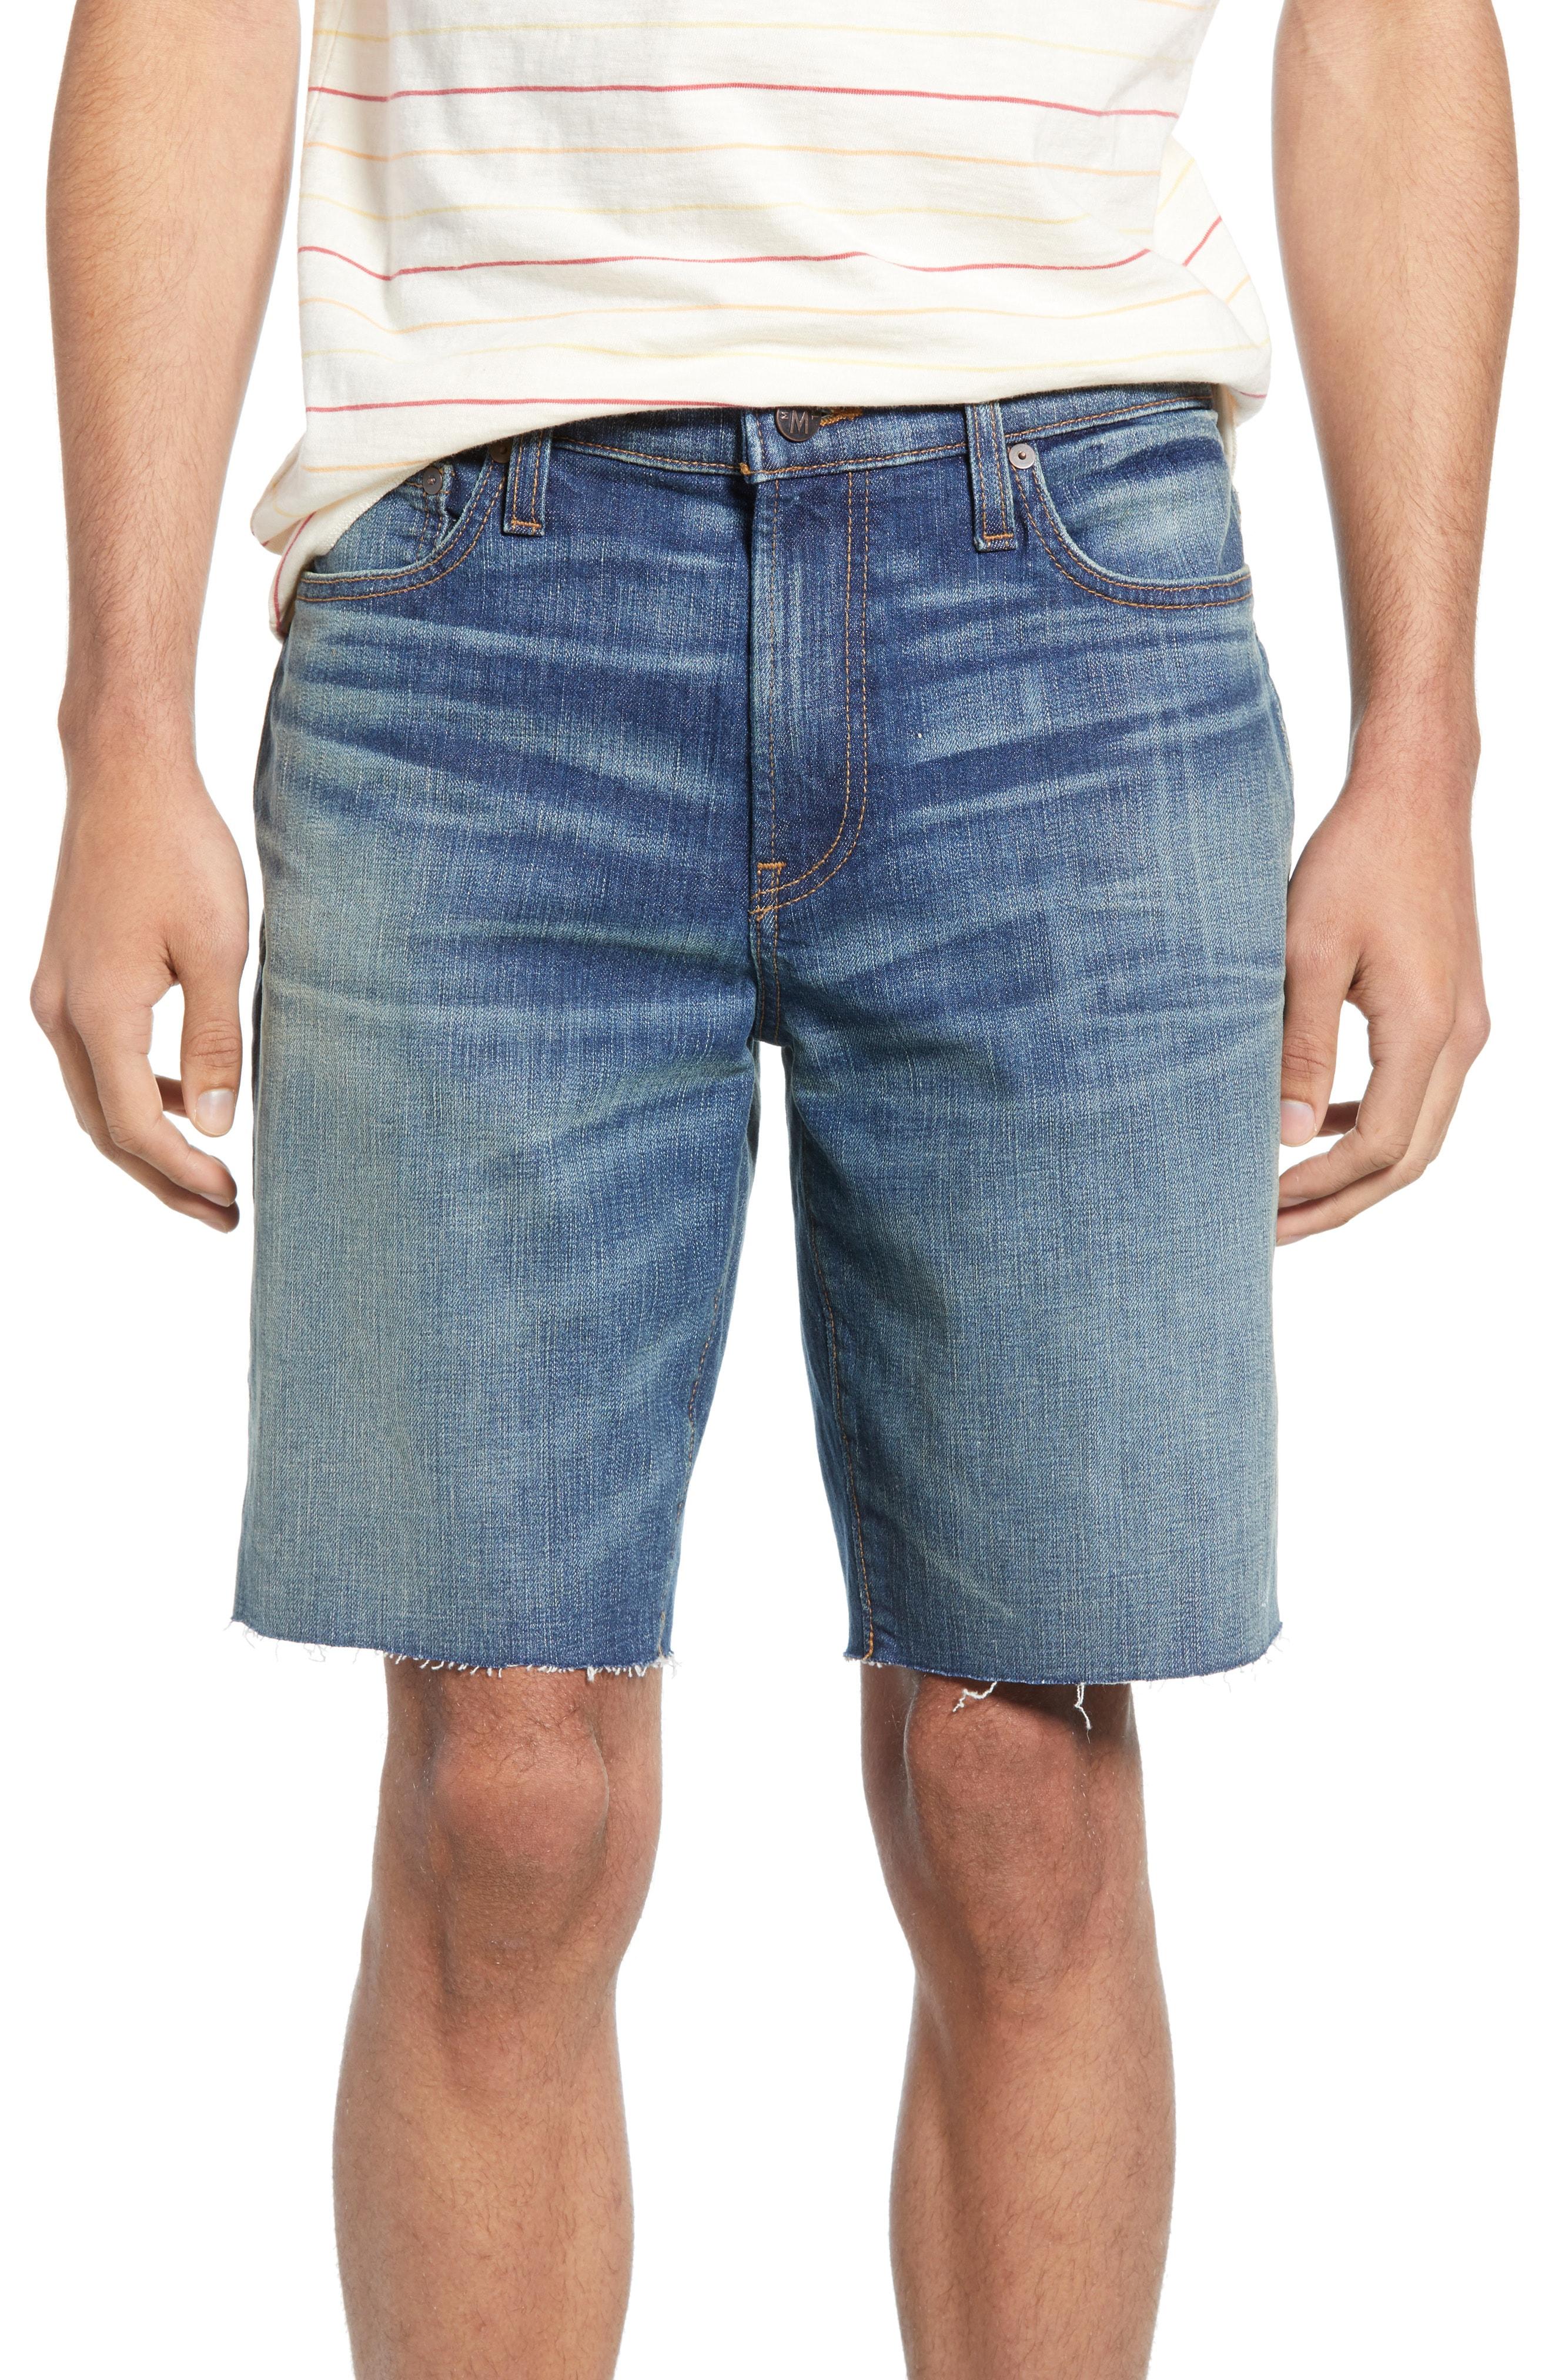 a7a209a8 Men's Madewell Cutoff Denim Shorts, Size 28 32 – Blue   The Fashionisto